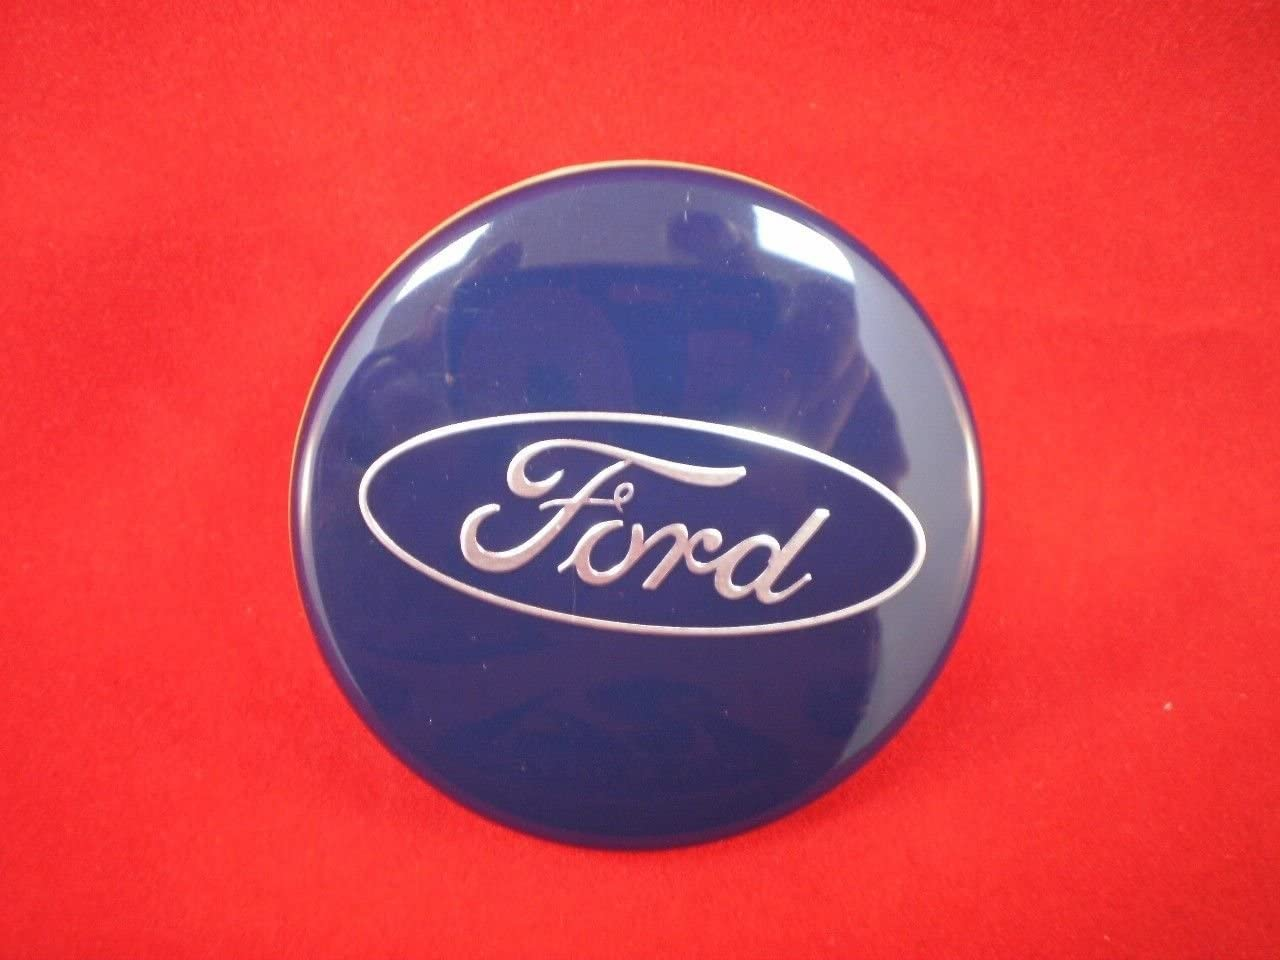 4 BLACK Wheel Center Hubcaps Emblem Rim Hub Cap Cover 54mm for Ford 6M21-1003-AA